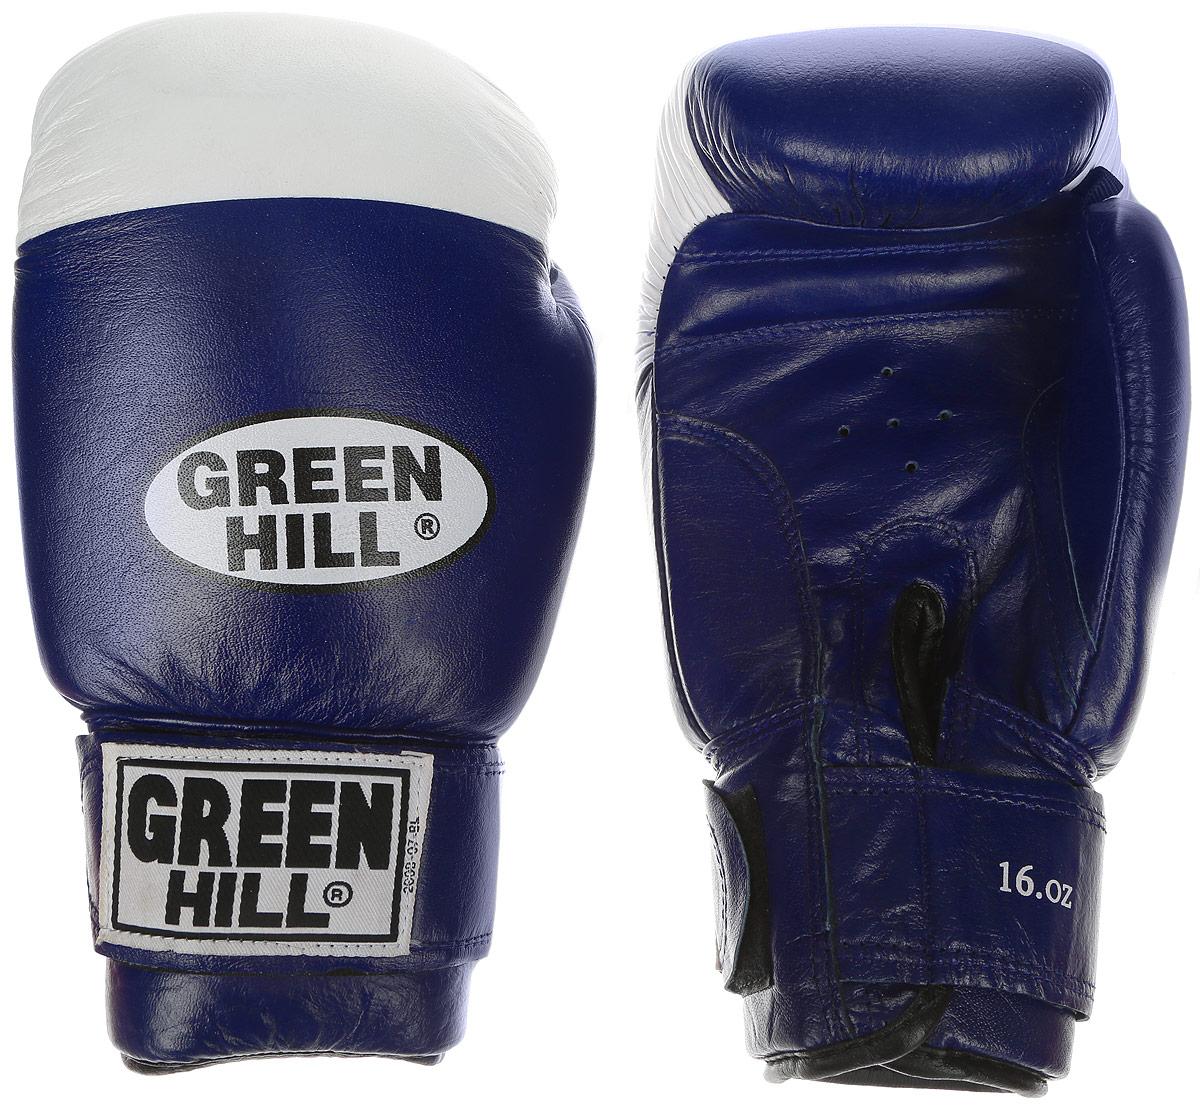 Перчатки боксерские Green Hill Super Star, цвет: синий, белый. Вес 16 унций. BGS-1213b перчатки боксерские green hill pro star цвет красный белый вес 16 унций bgps 2012